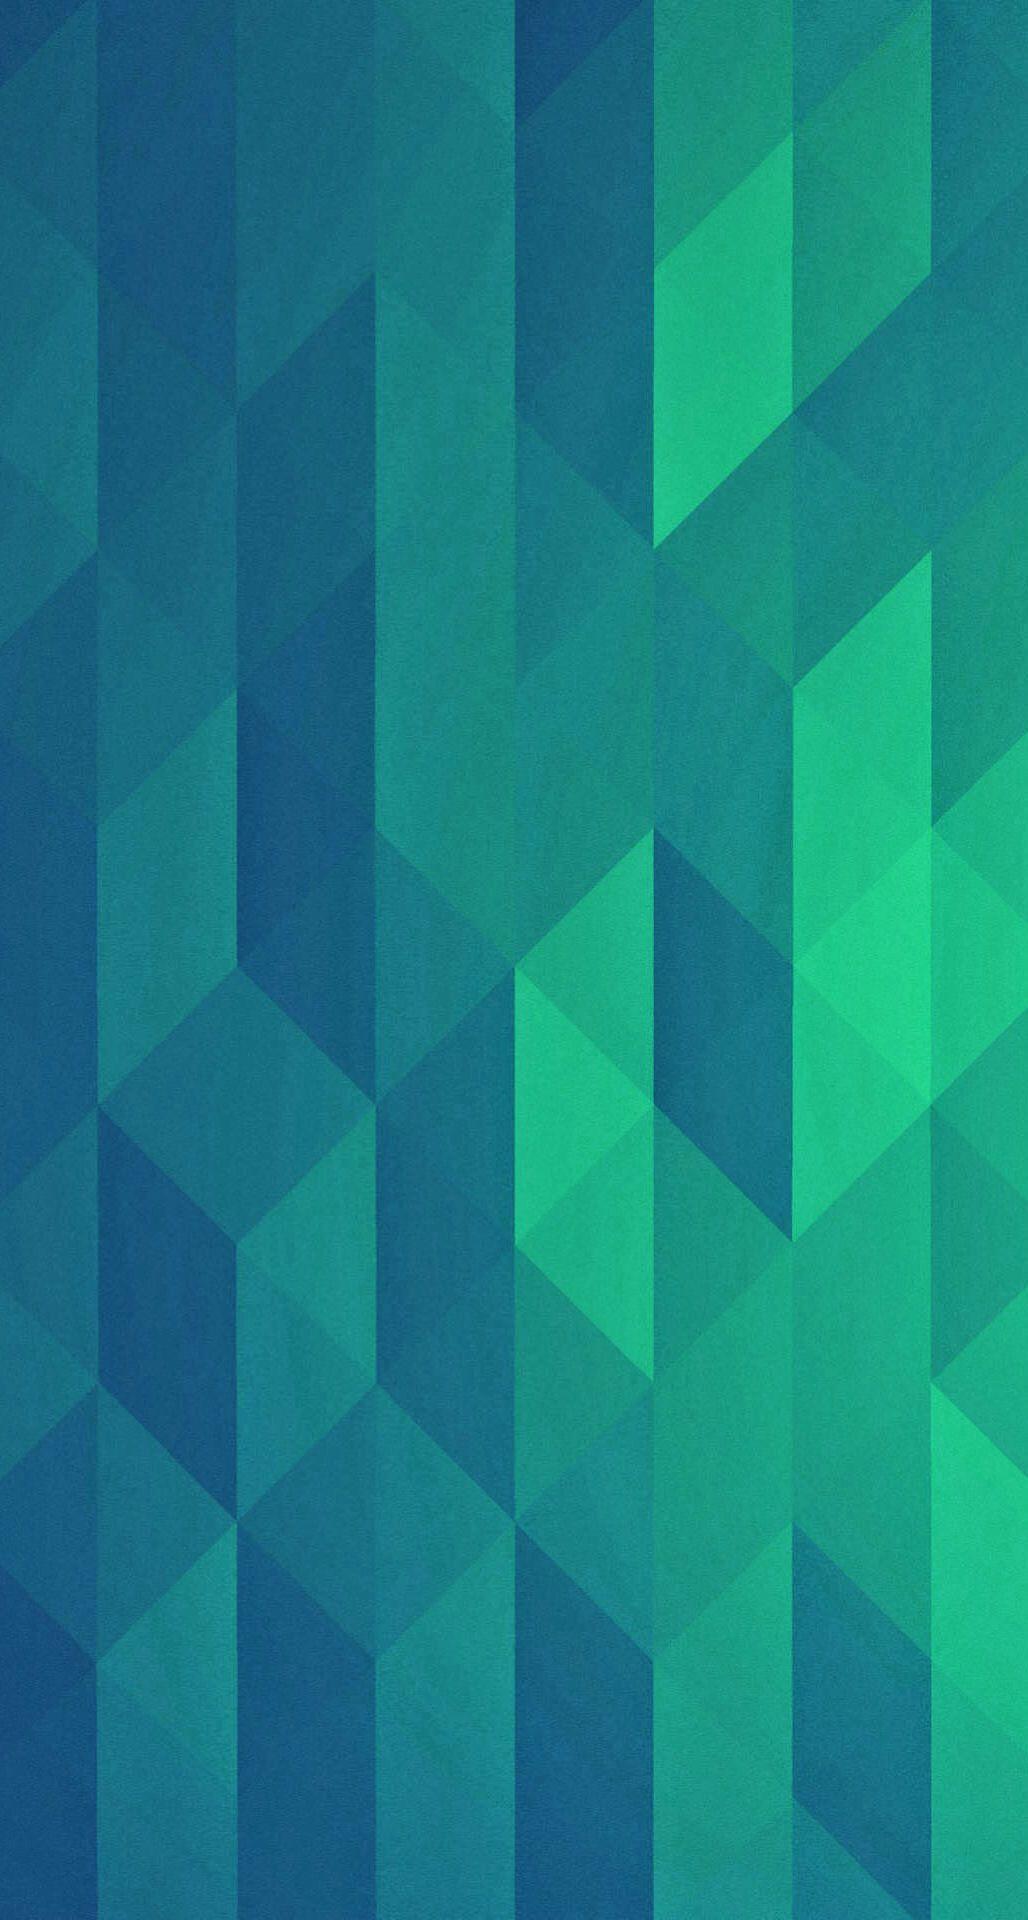 wallpaper Geometric wallpaper iphone, Pattern wallpaper